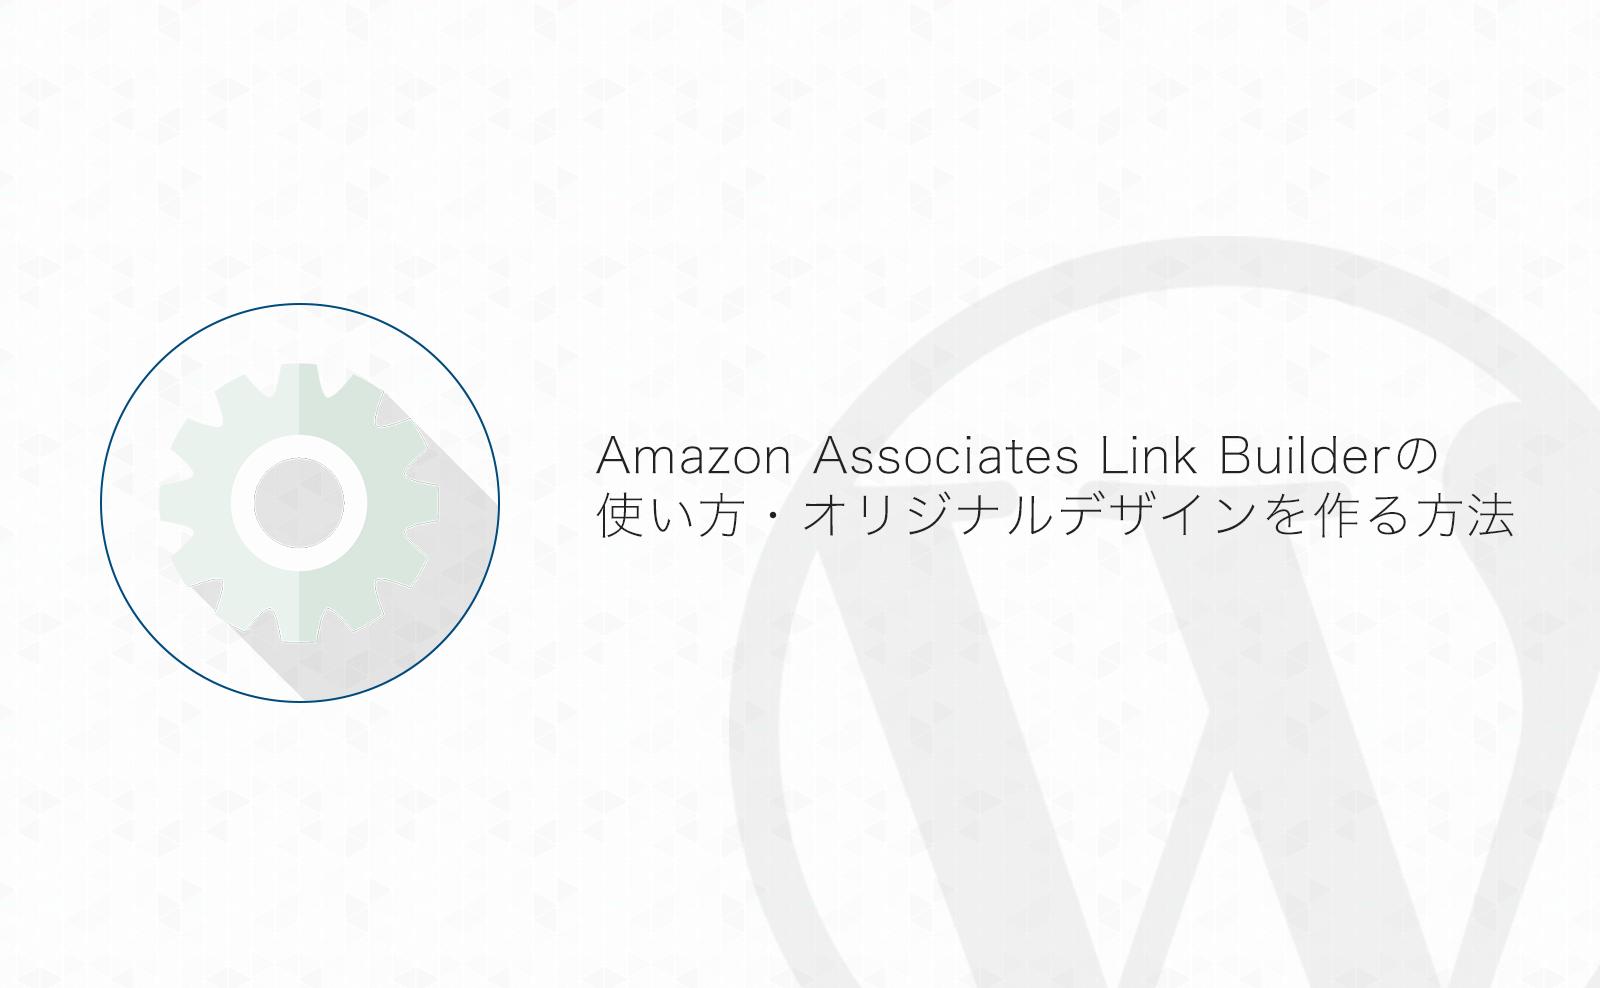 【WordPress】Amazon Associates Link Builderを使ってオリジナルデザインでAmazonのアフィリエイトリンクを作成する方法